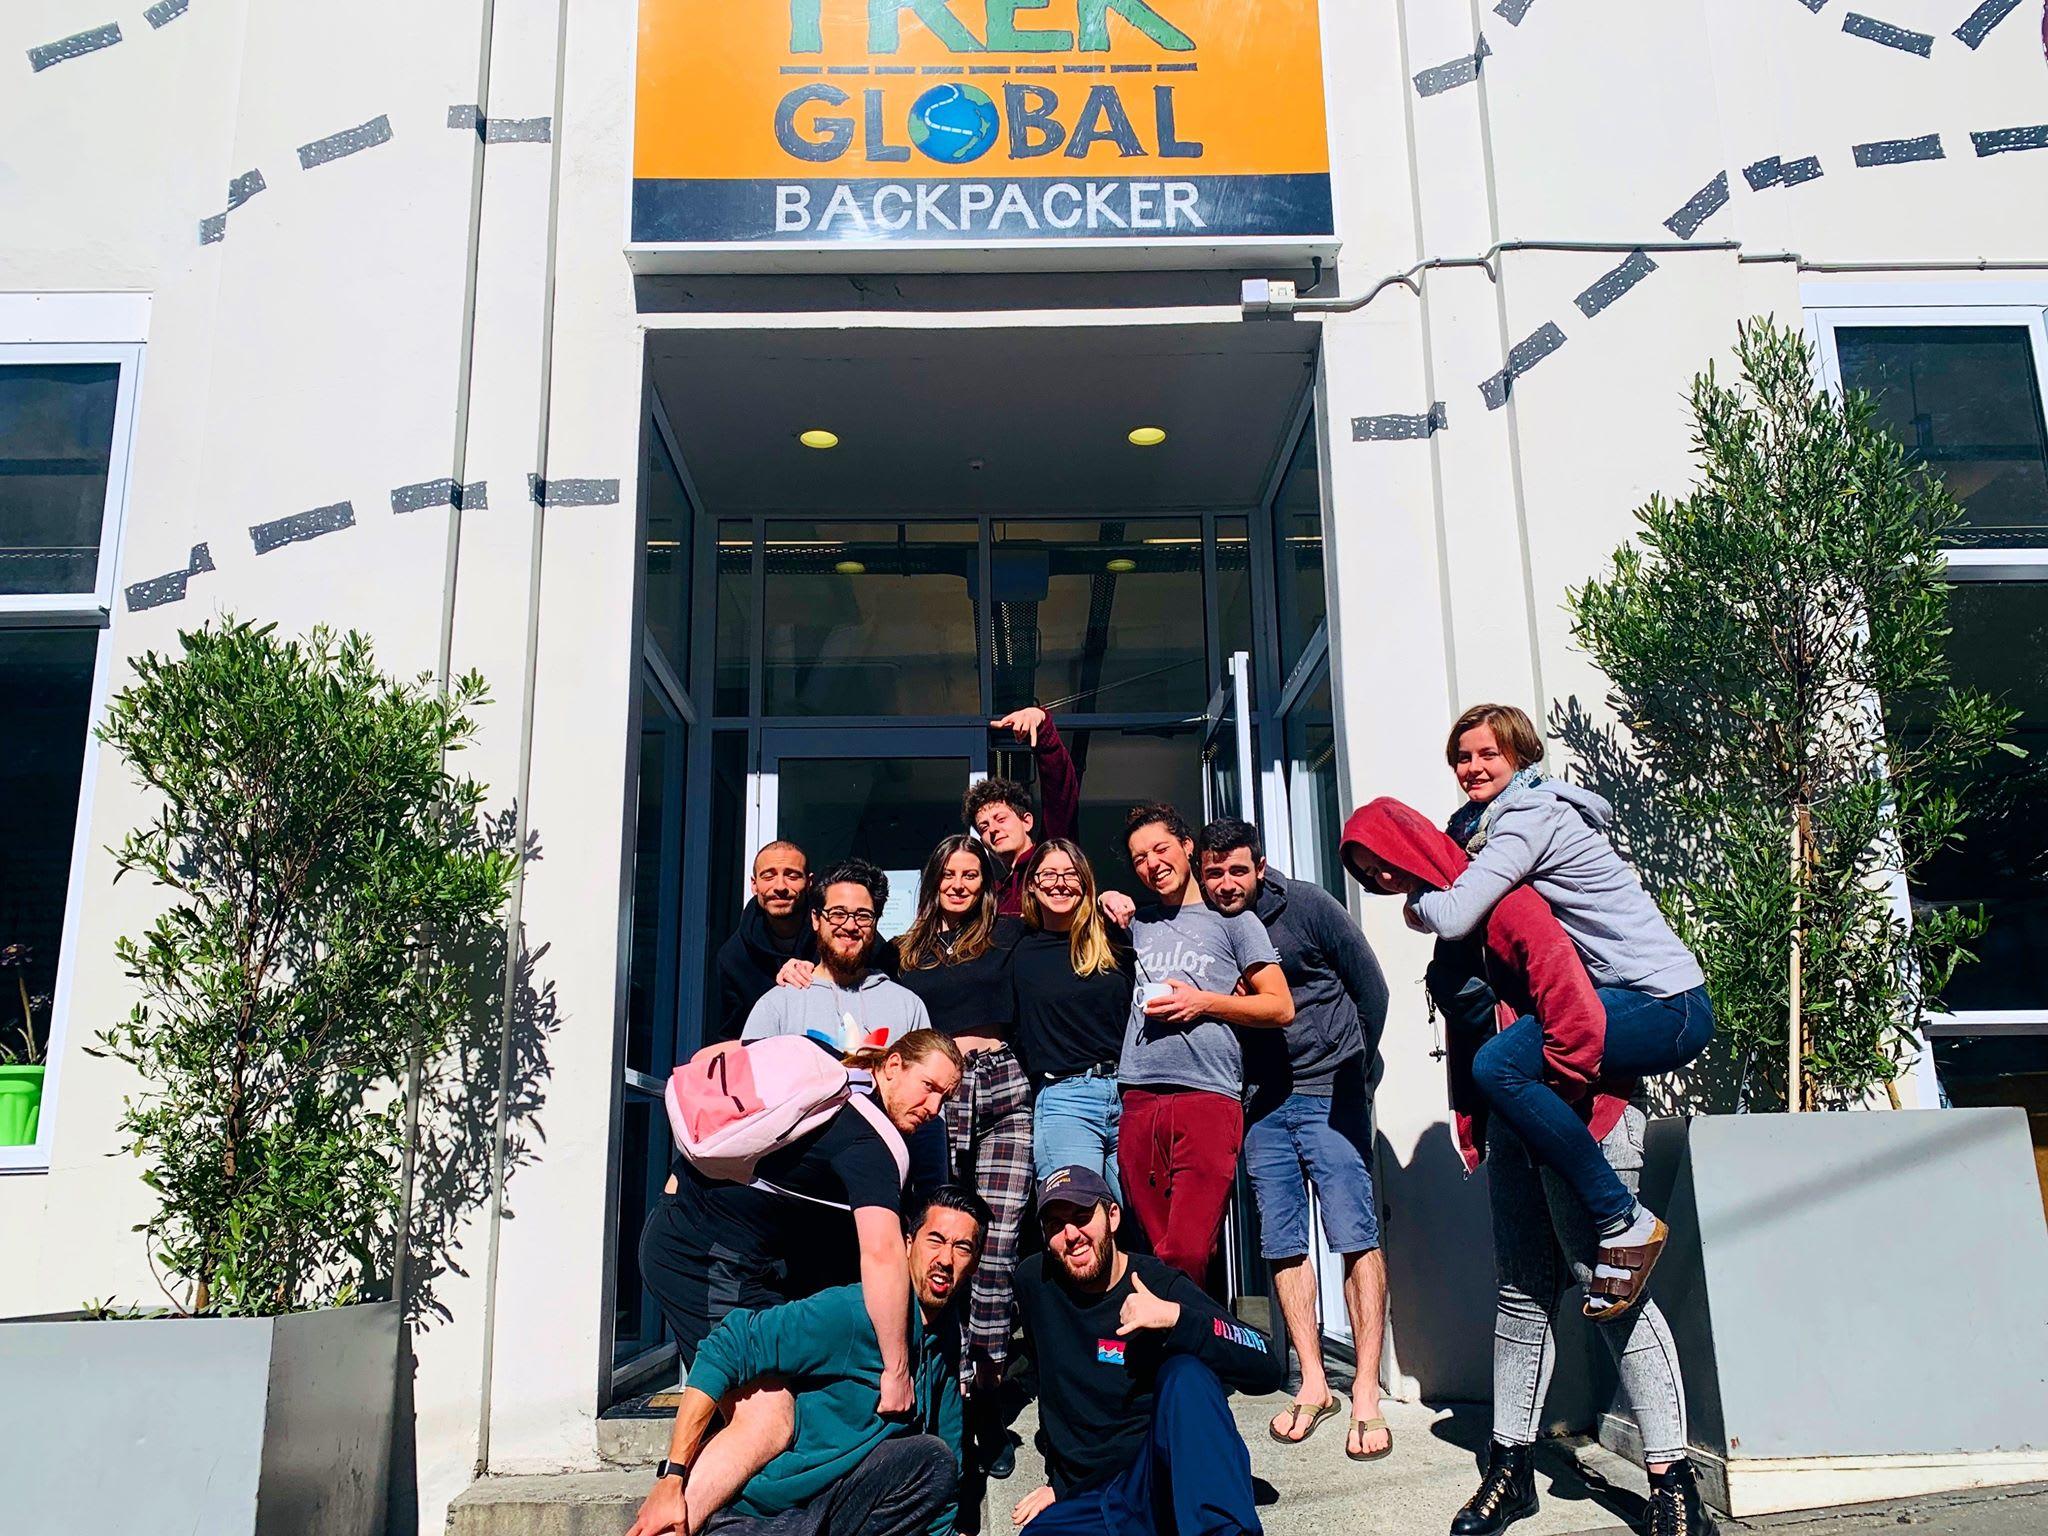 Trek Global